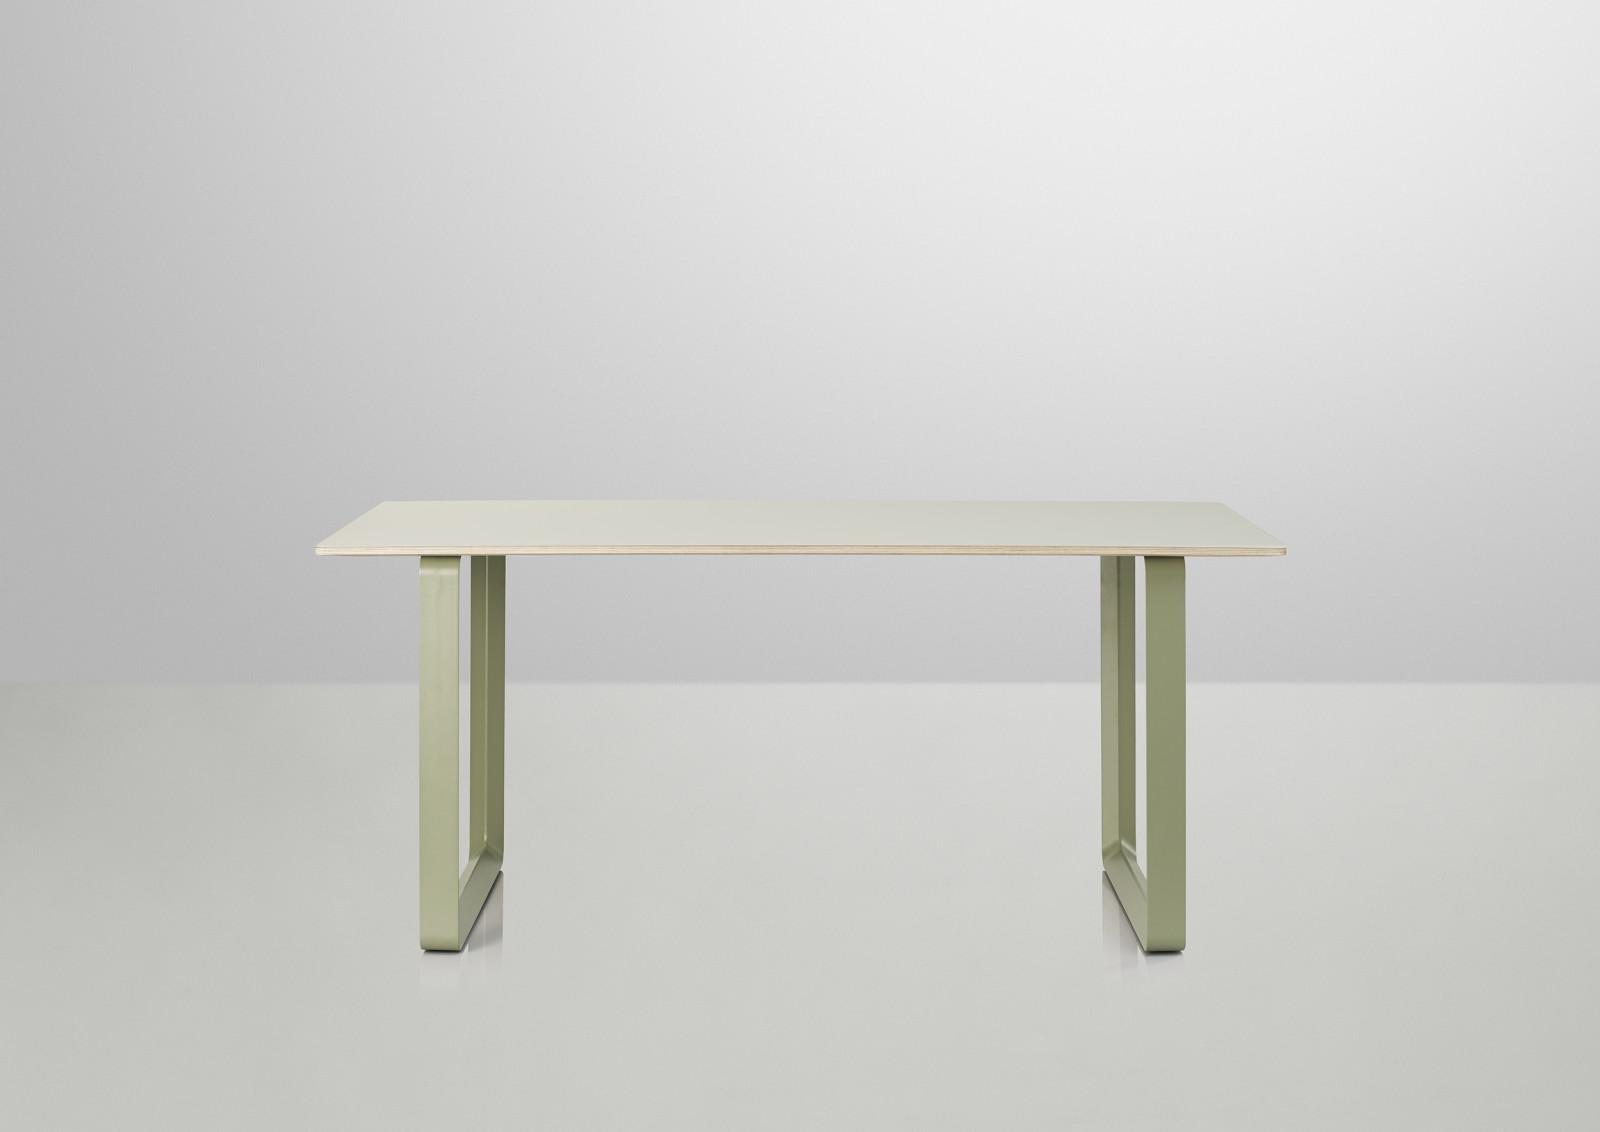 70/70 Table Small, Light Green, Light Green